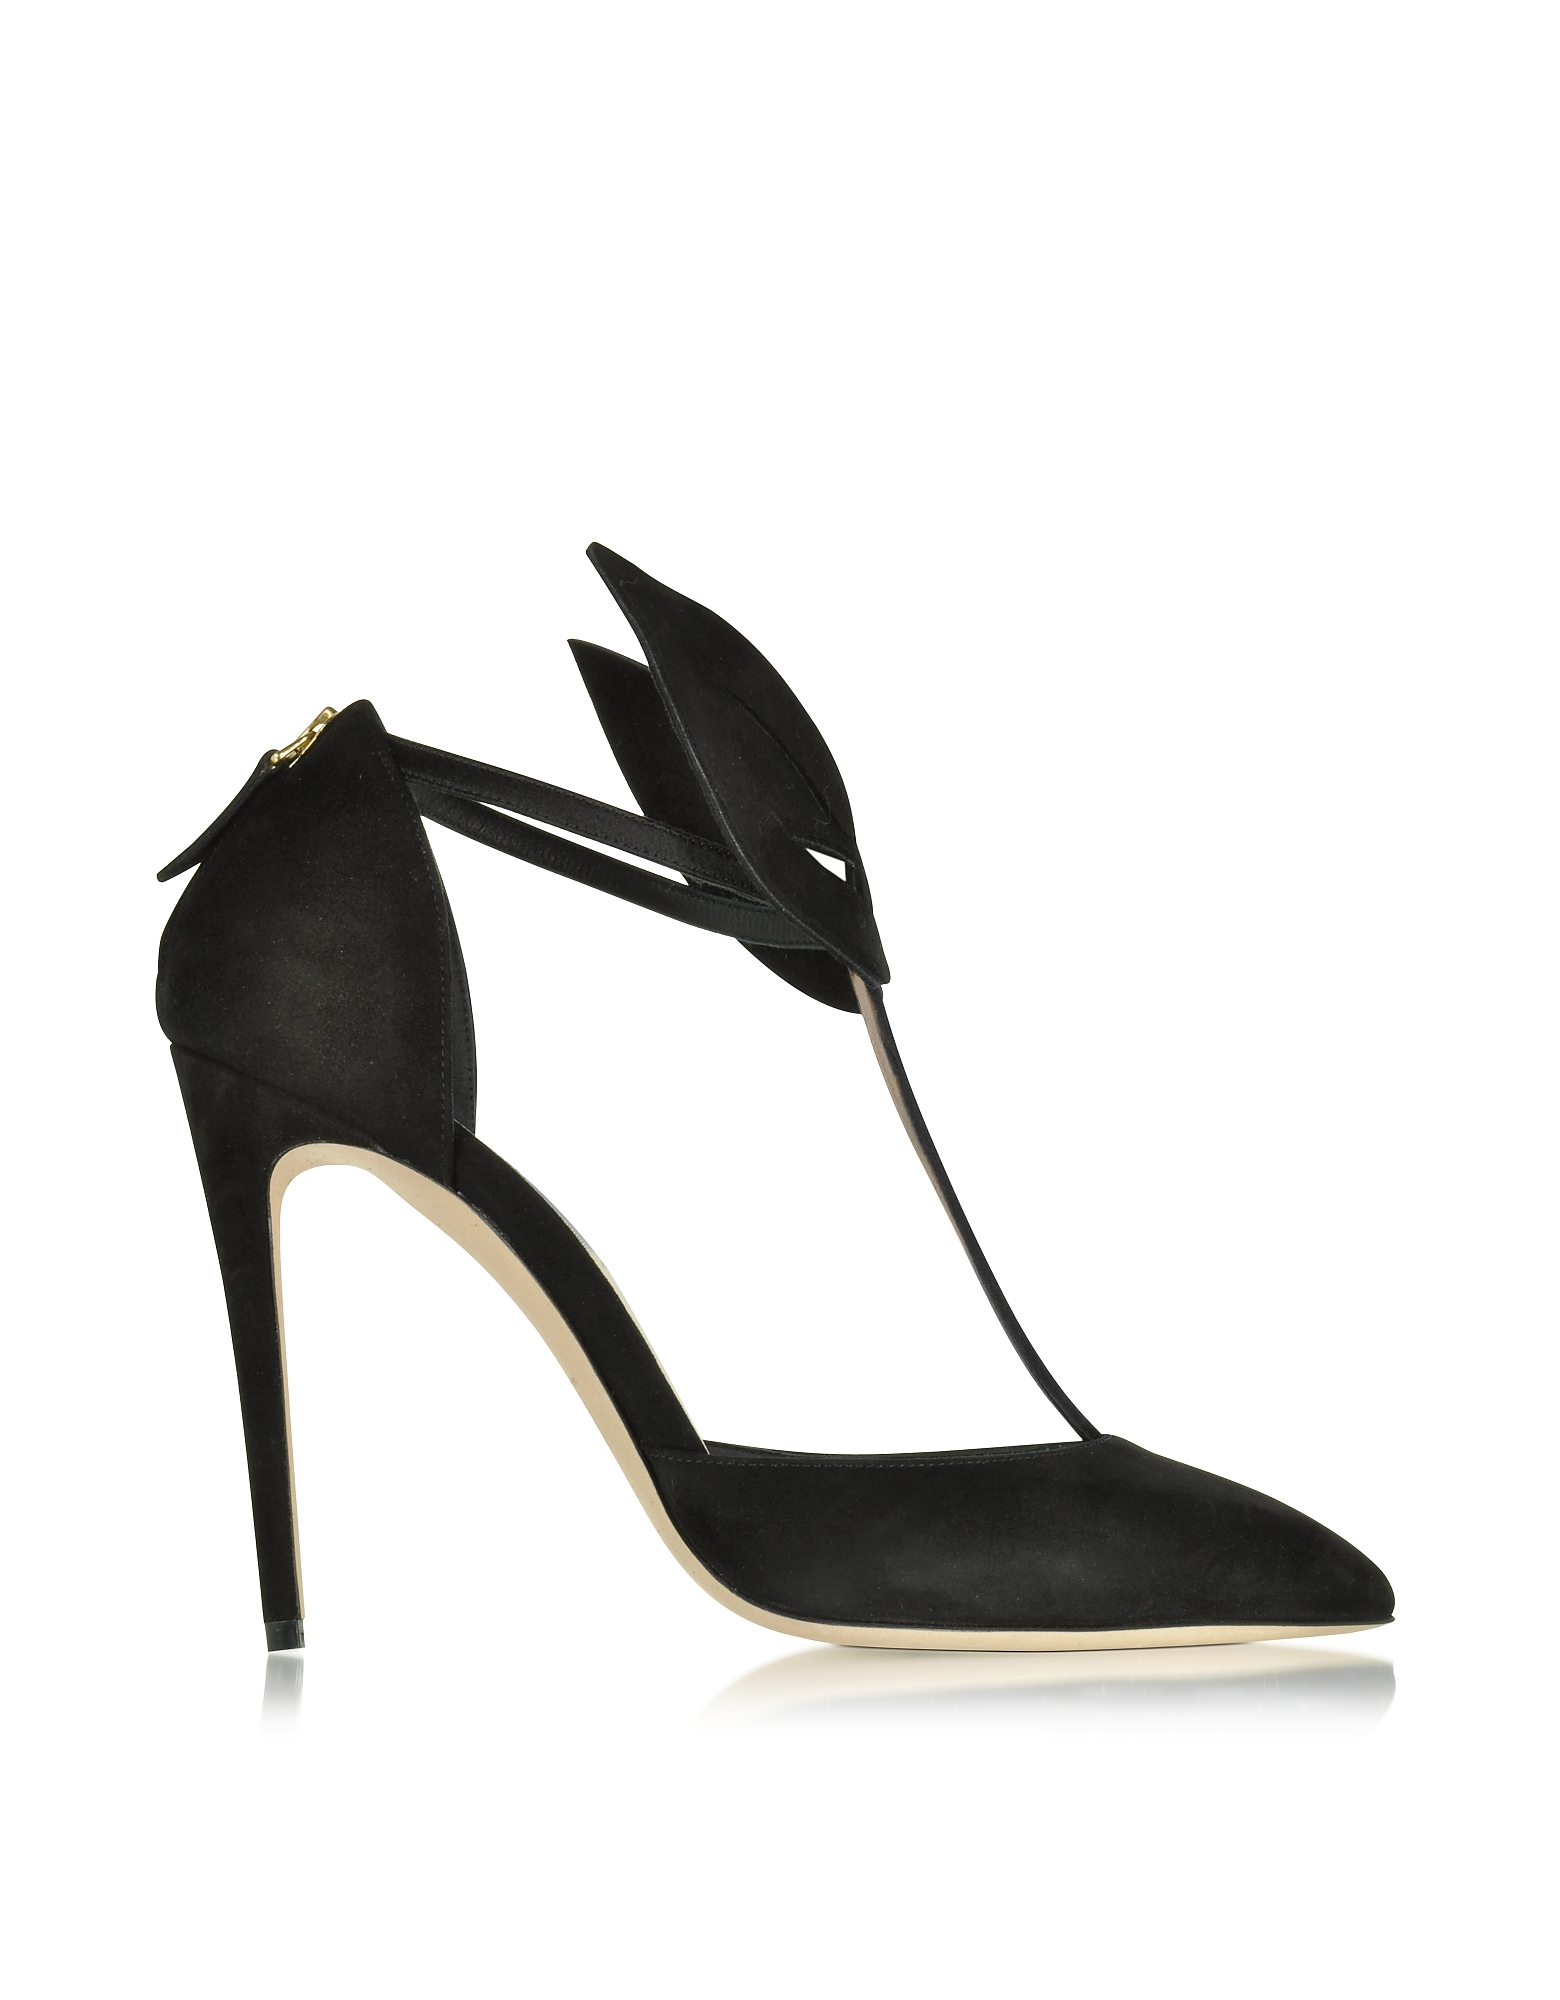 Olgana Paris Shoes, Le Masque Black Suede and Satin Pump